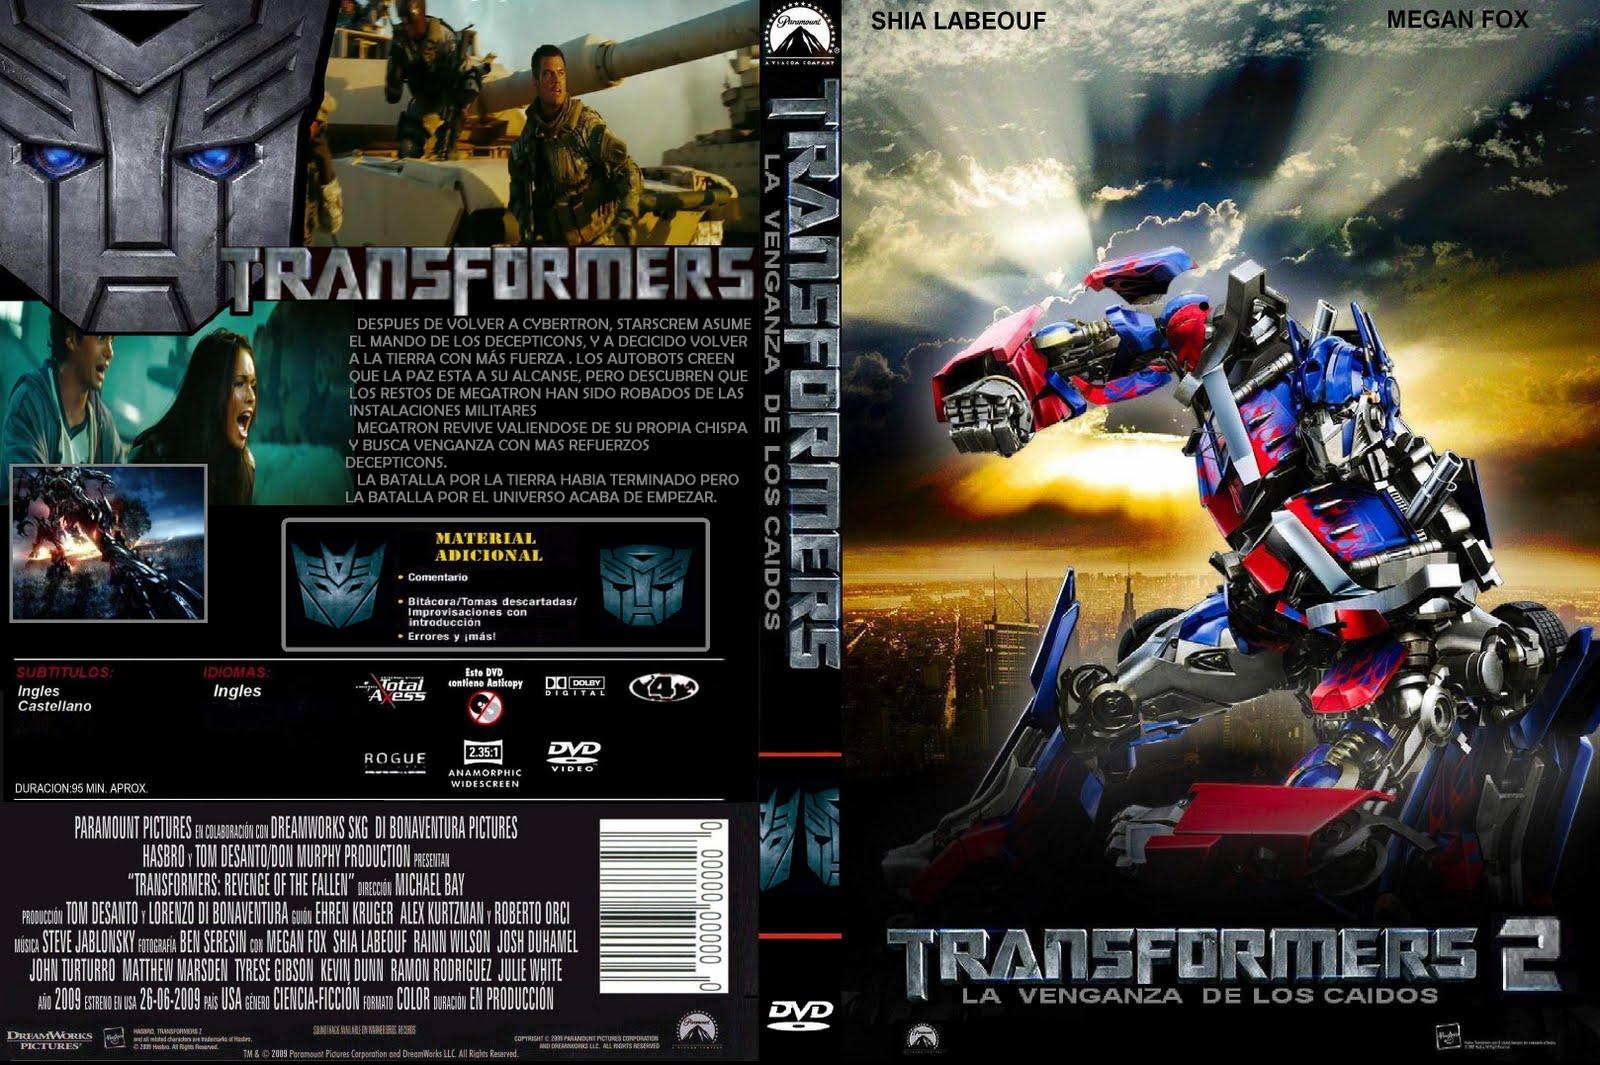 transformers 2 dvdrip xvid maxspeed subtitles alrelink. Black Bedroom Furniture Sets. Home Design Ideas